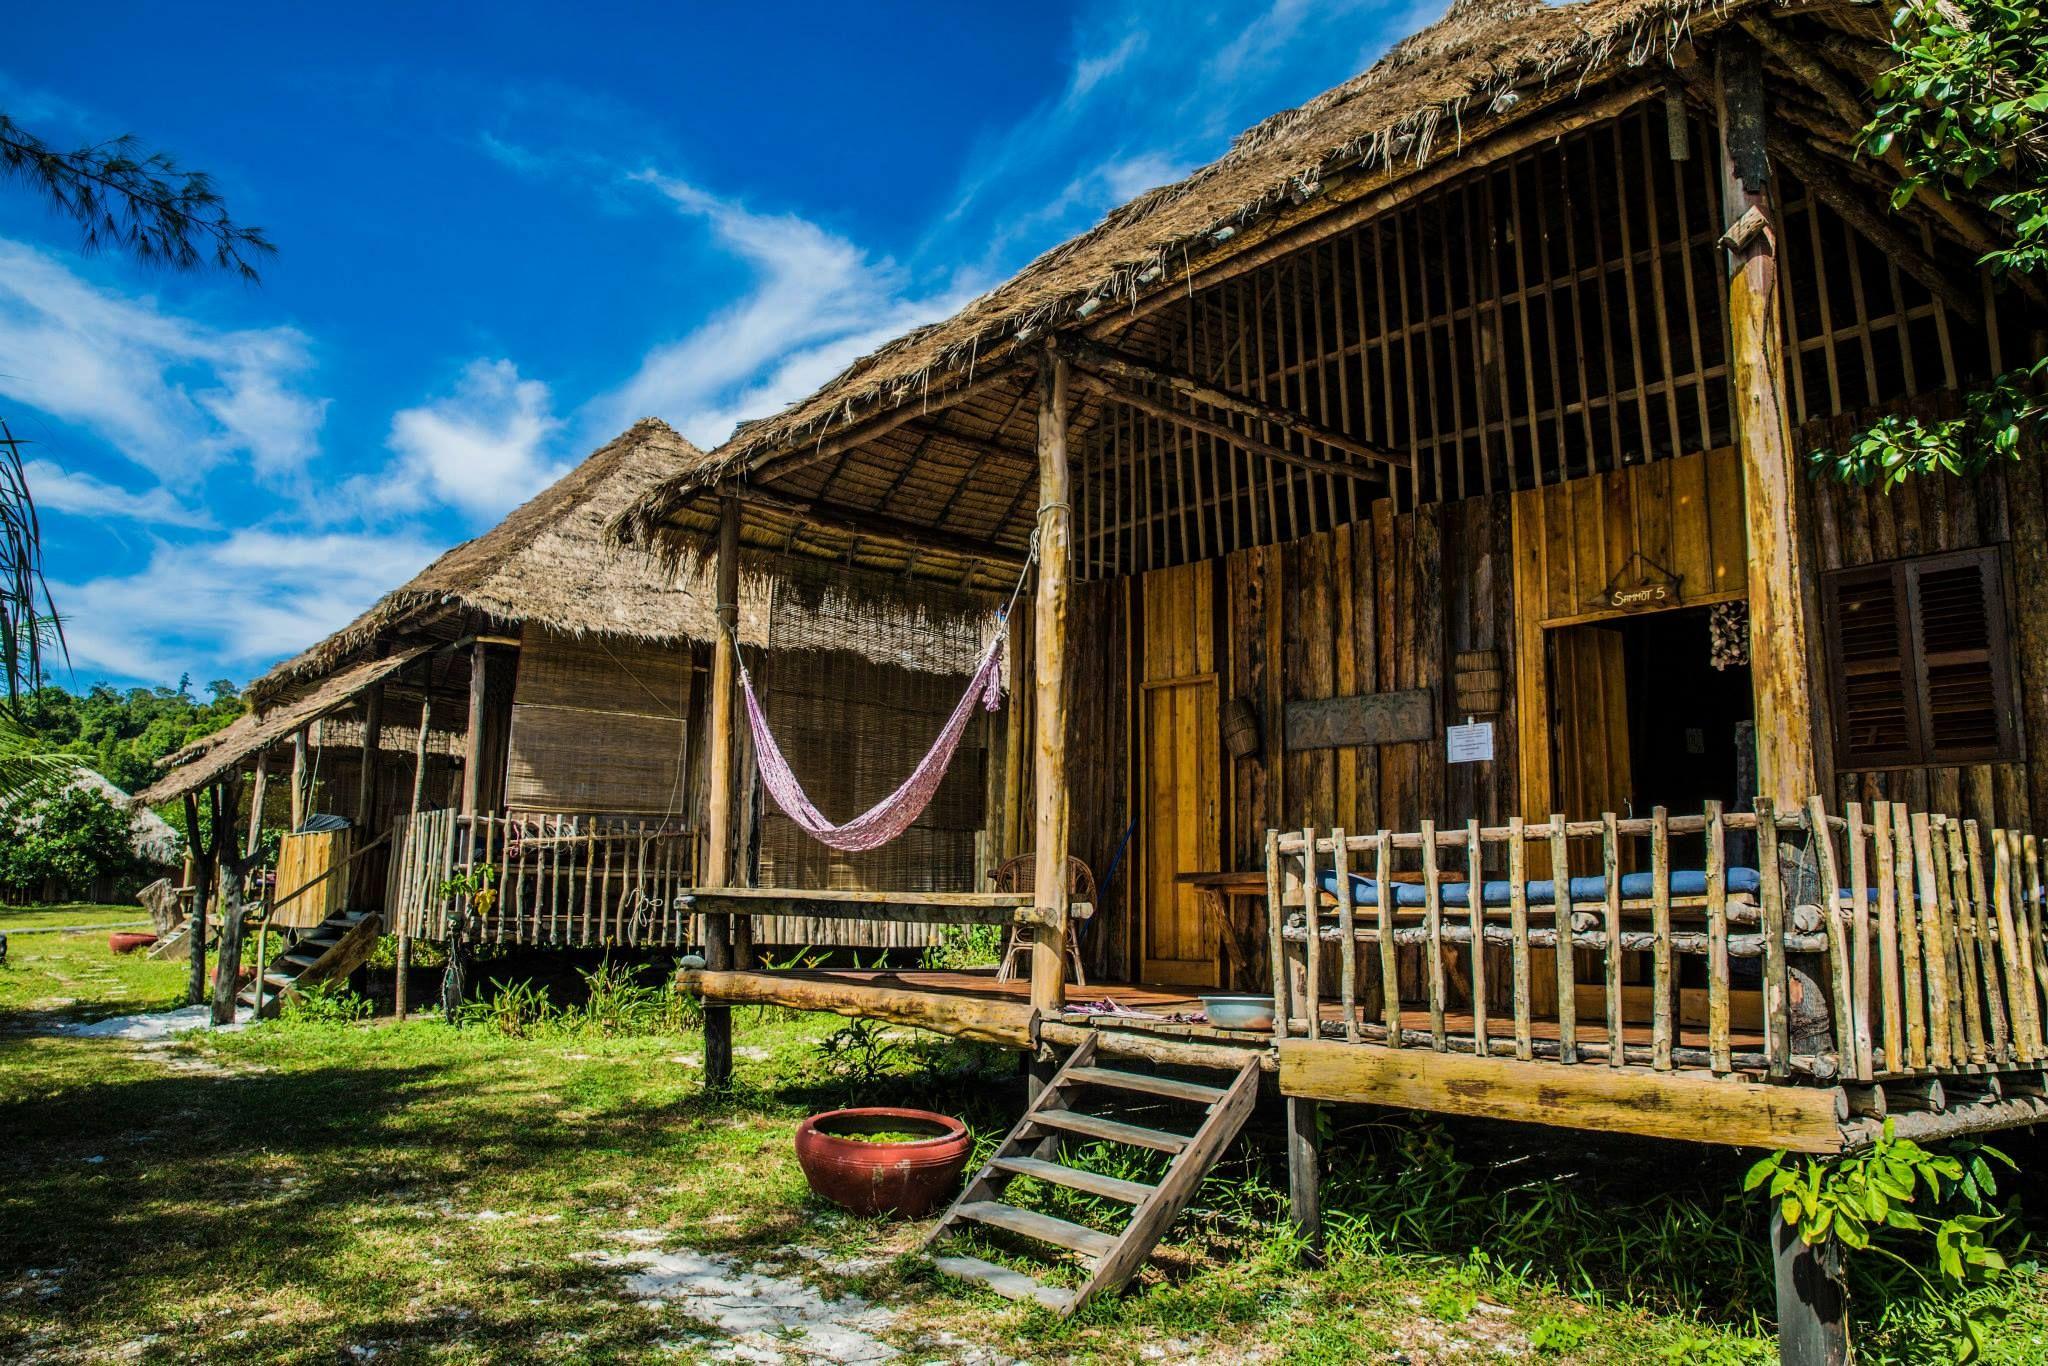 PARADISE Villas & Bungalows – on Koh Rong Sanloem & Koh Rong